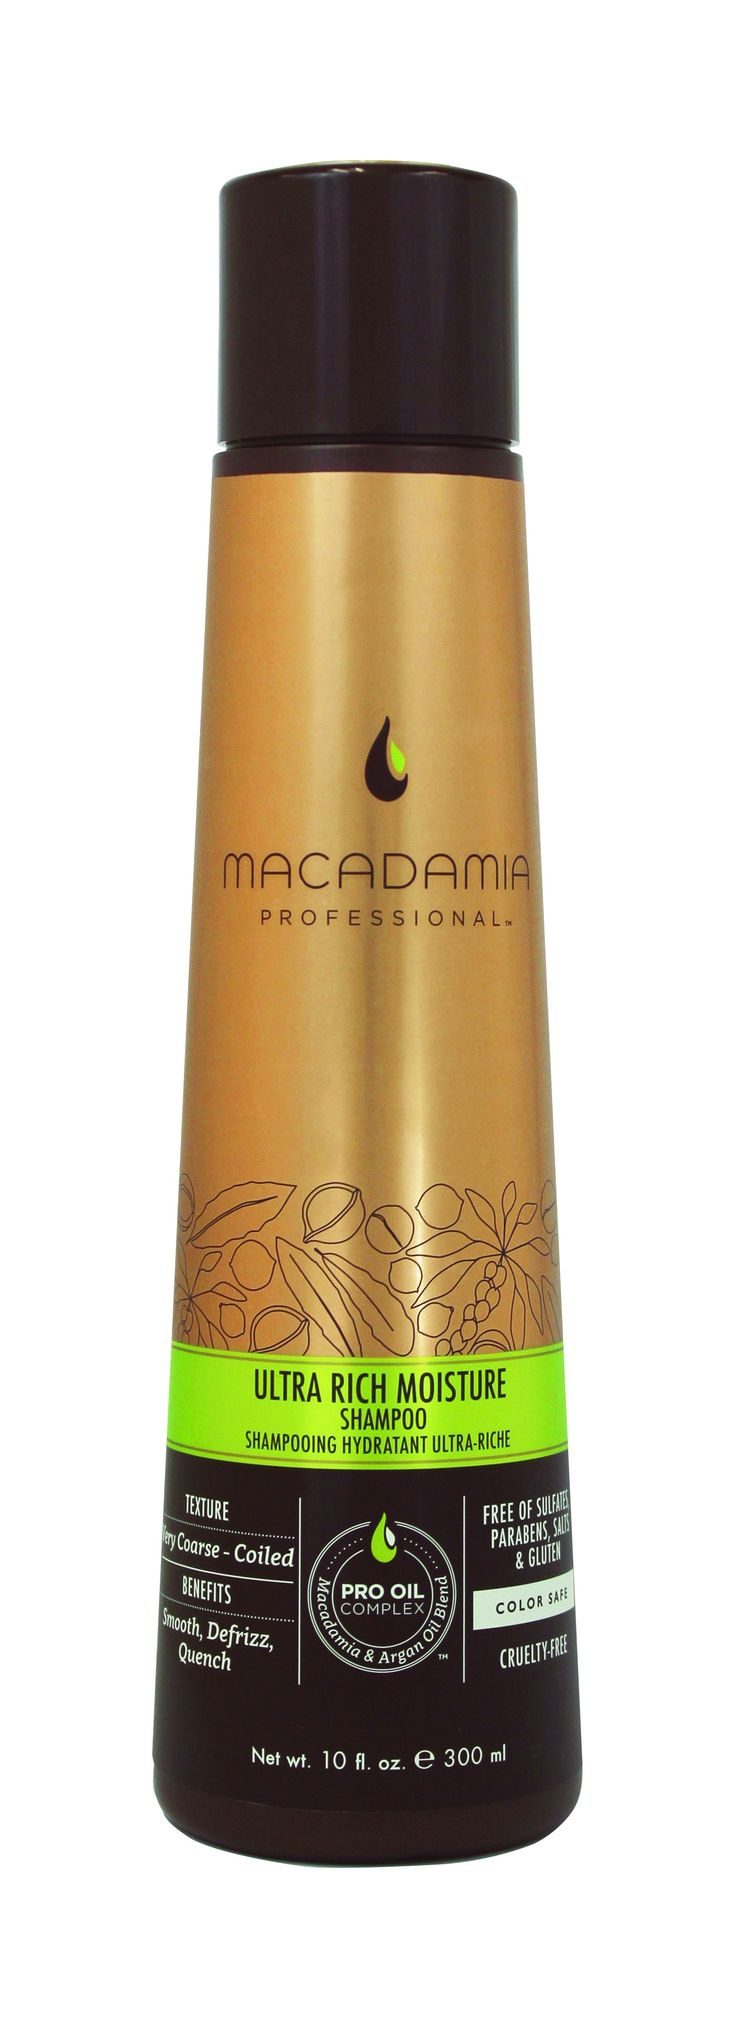 Macadamia Professional Ultra Rich Moisture Shampoo 300ml.